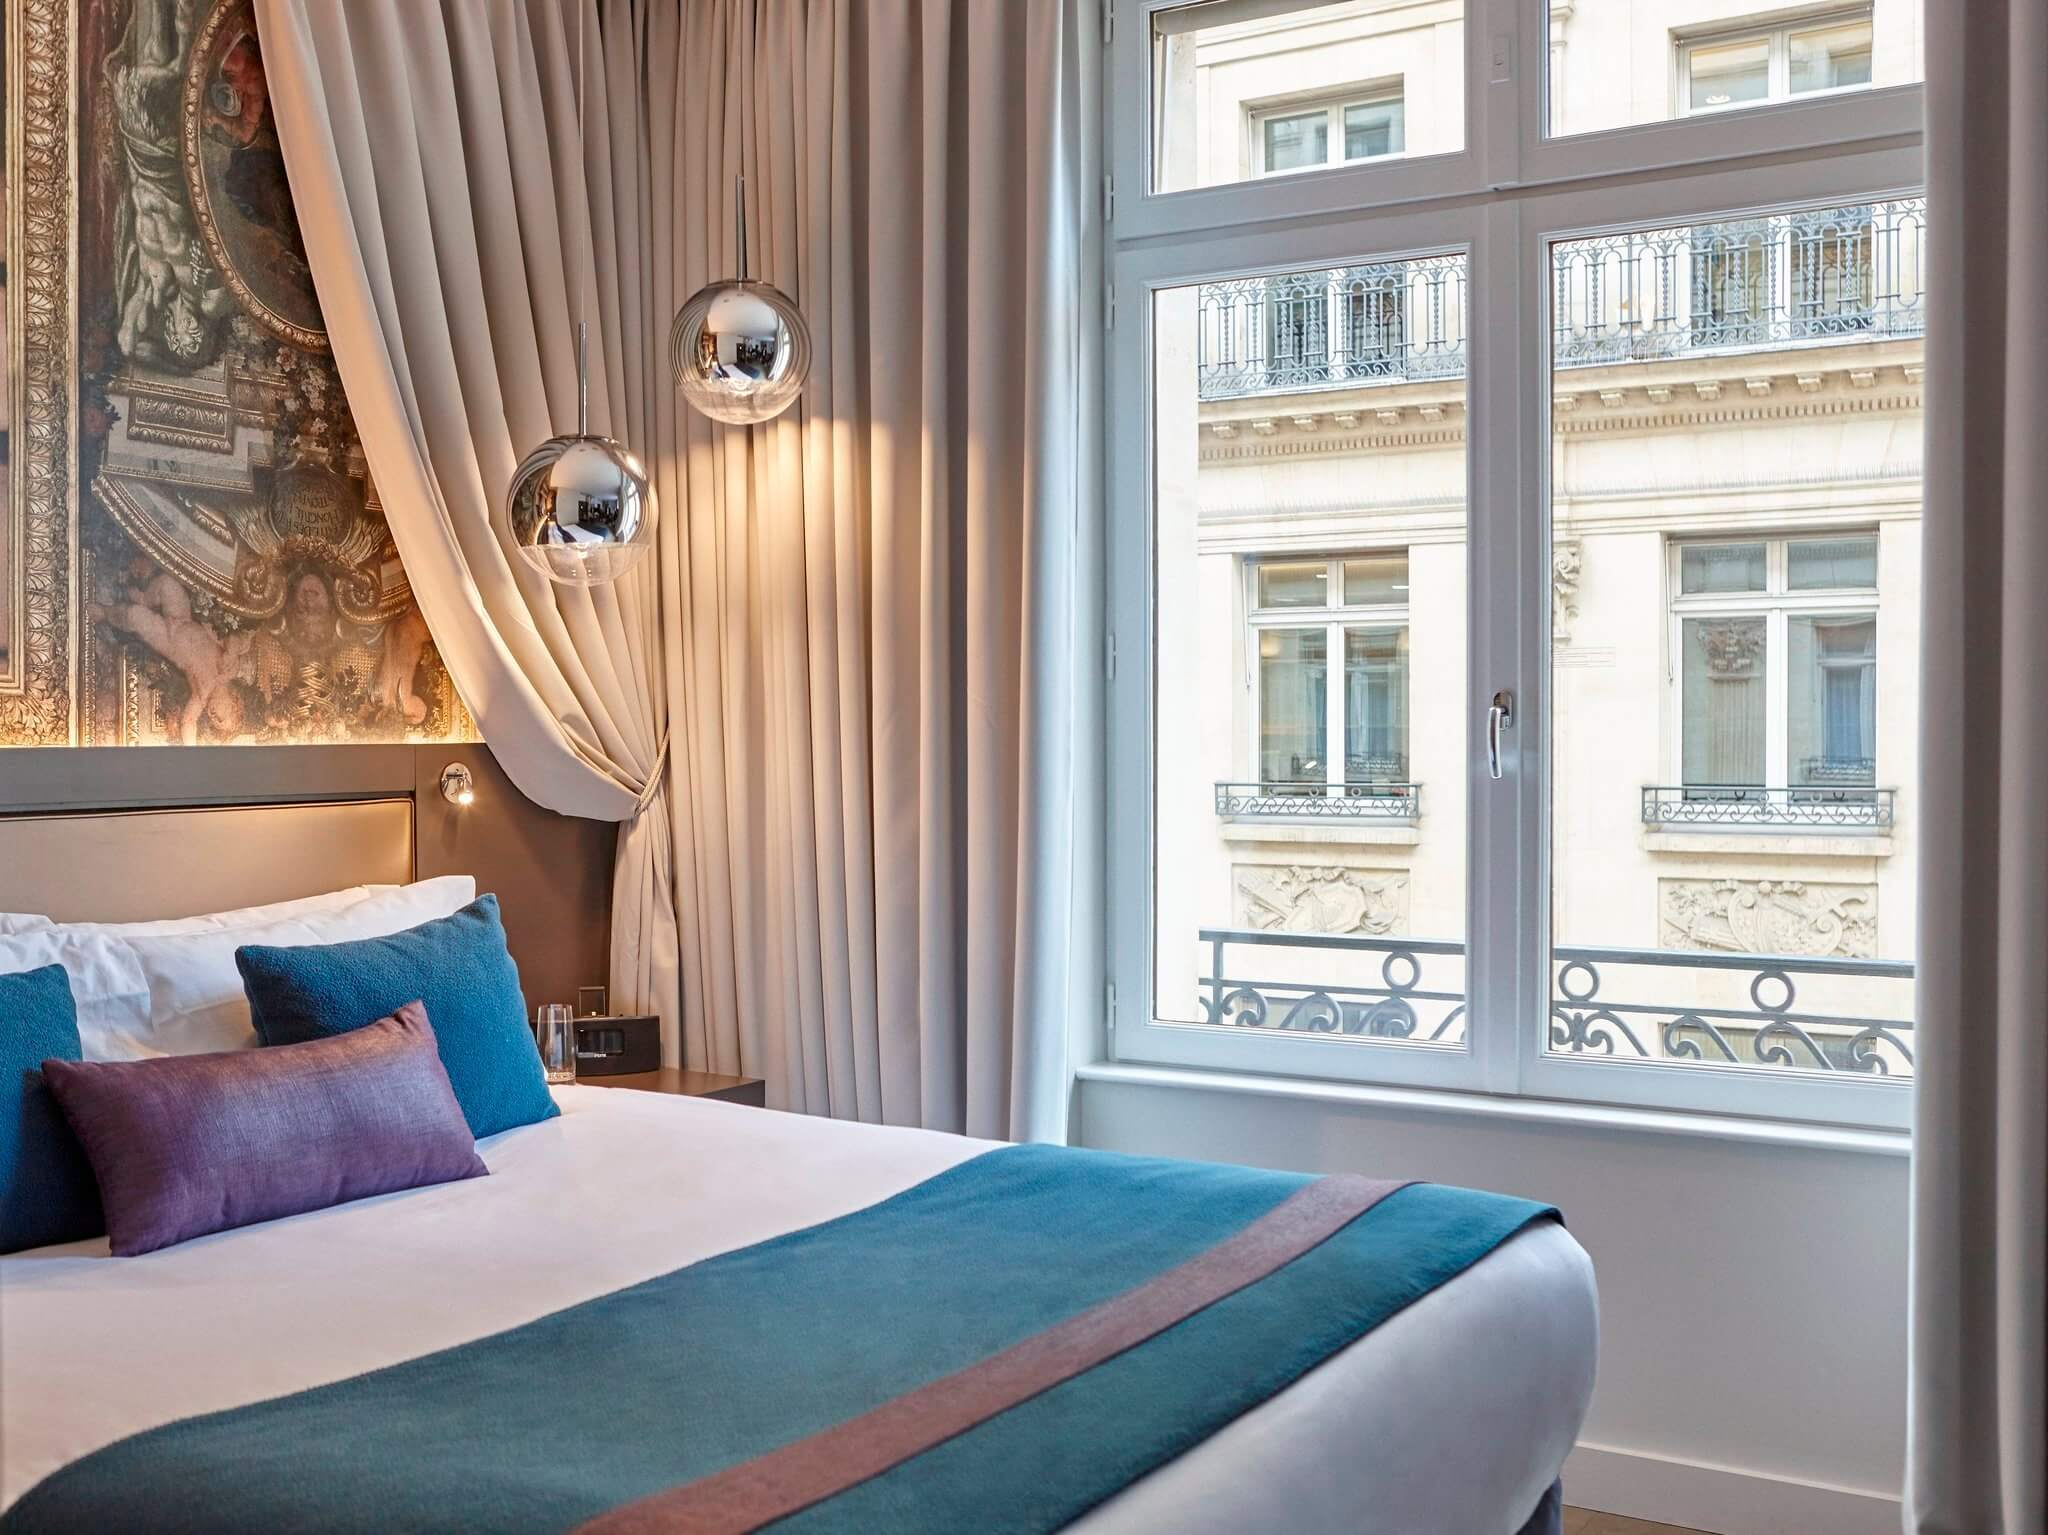 blog-article-places-stay-paris-indigo-hotel